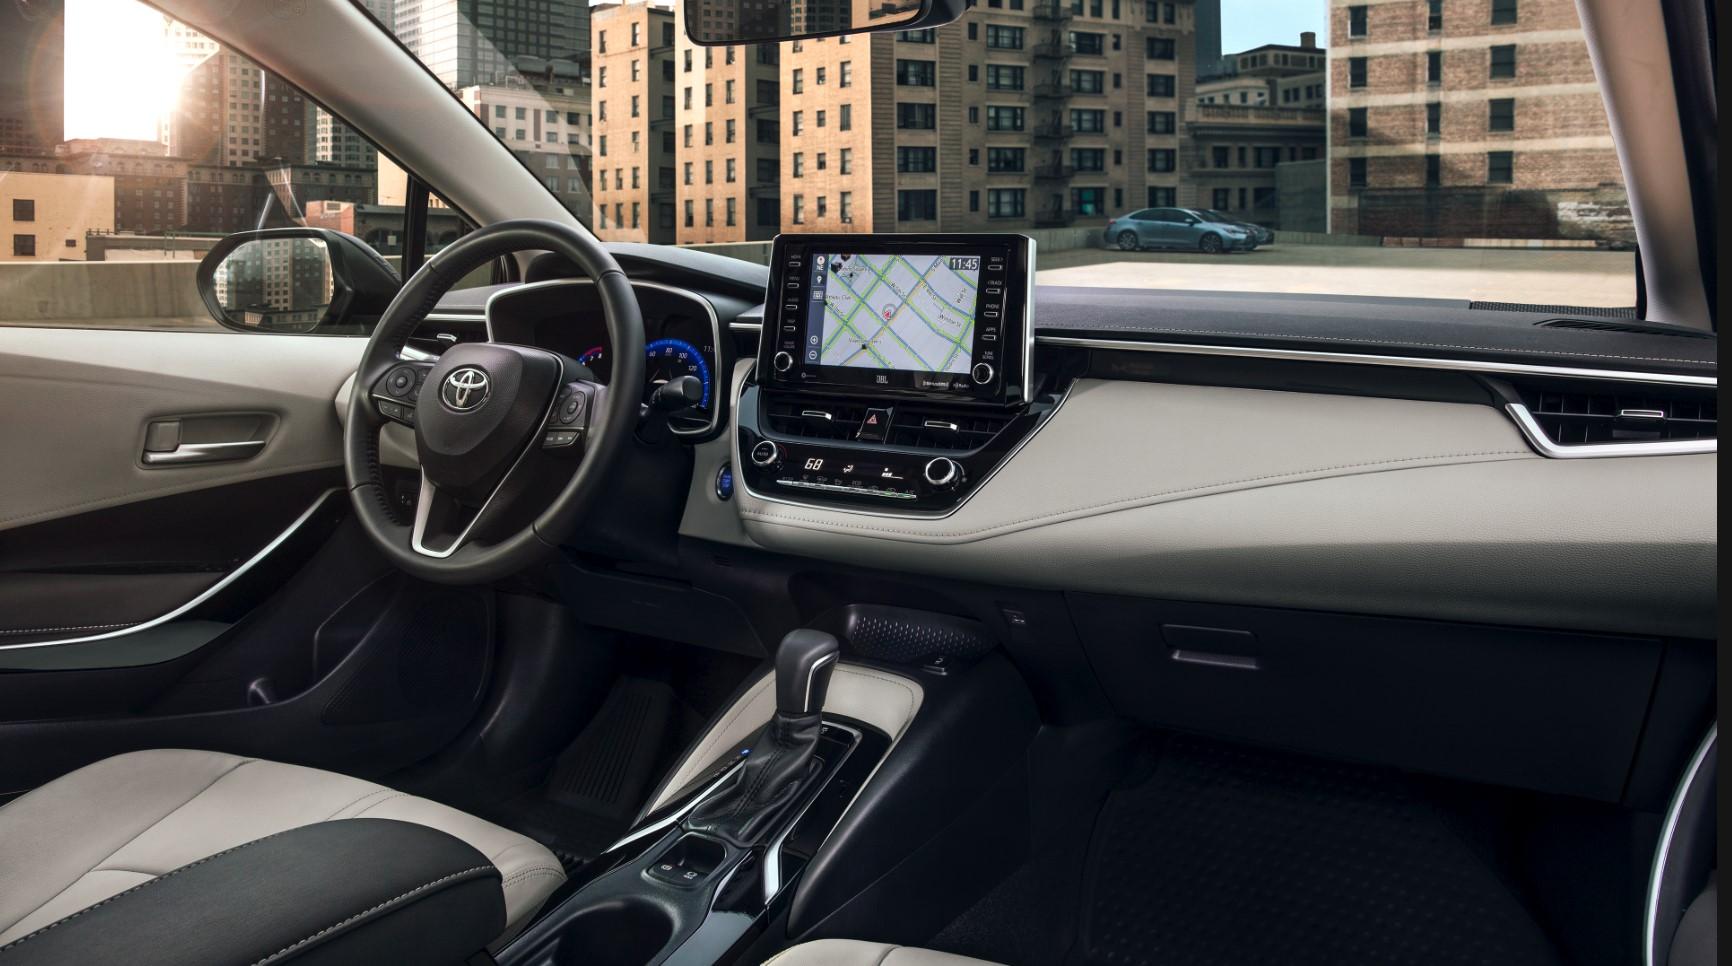 2020 Corolla Cockpit